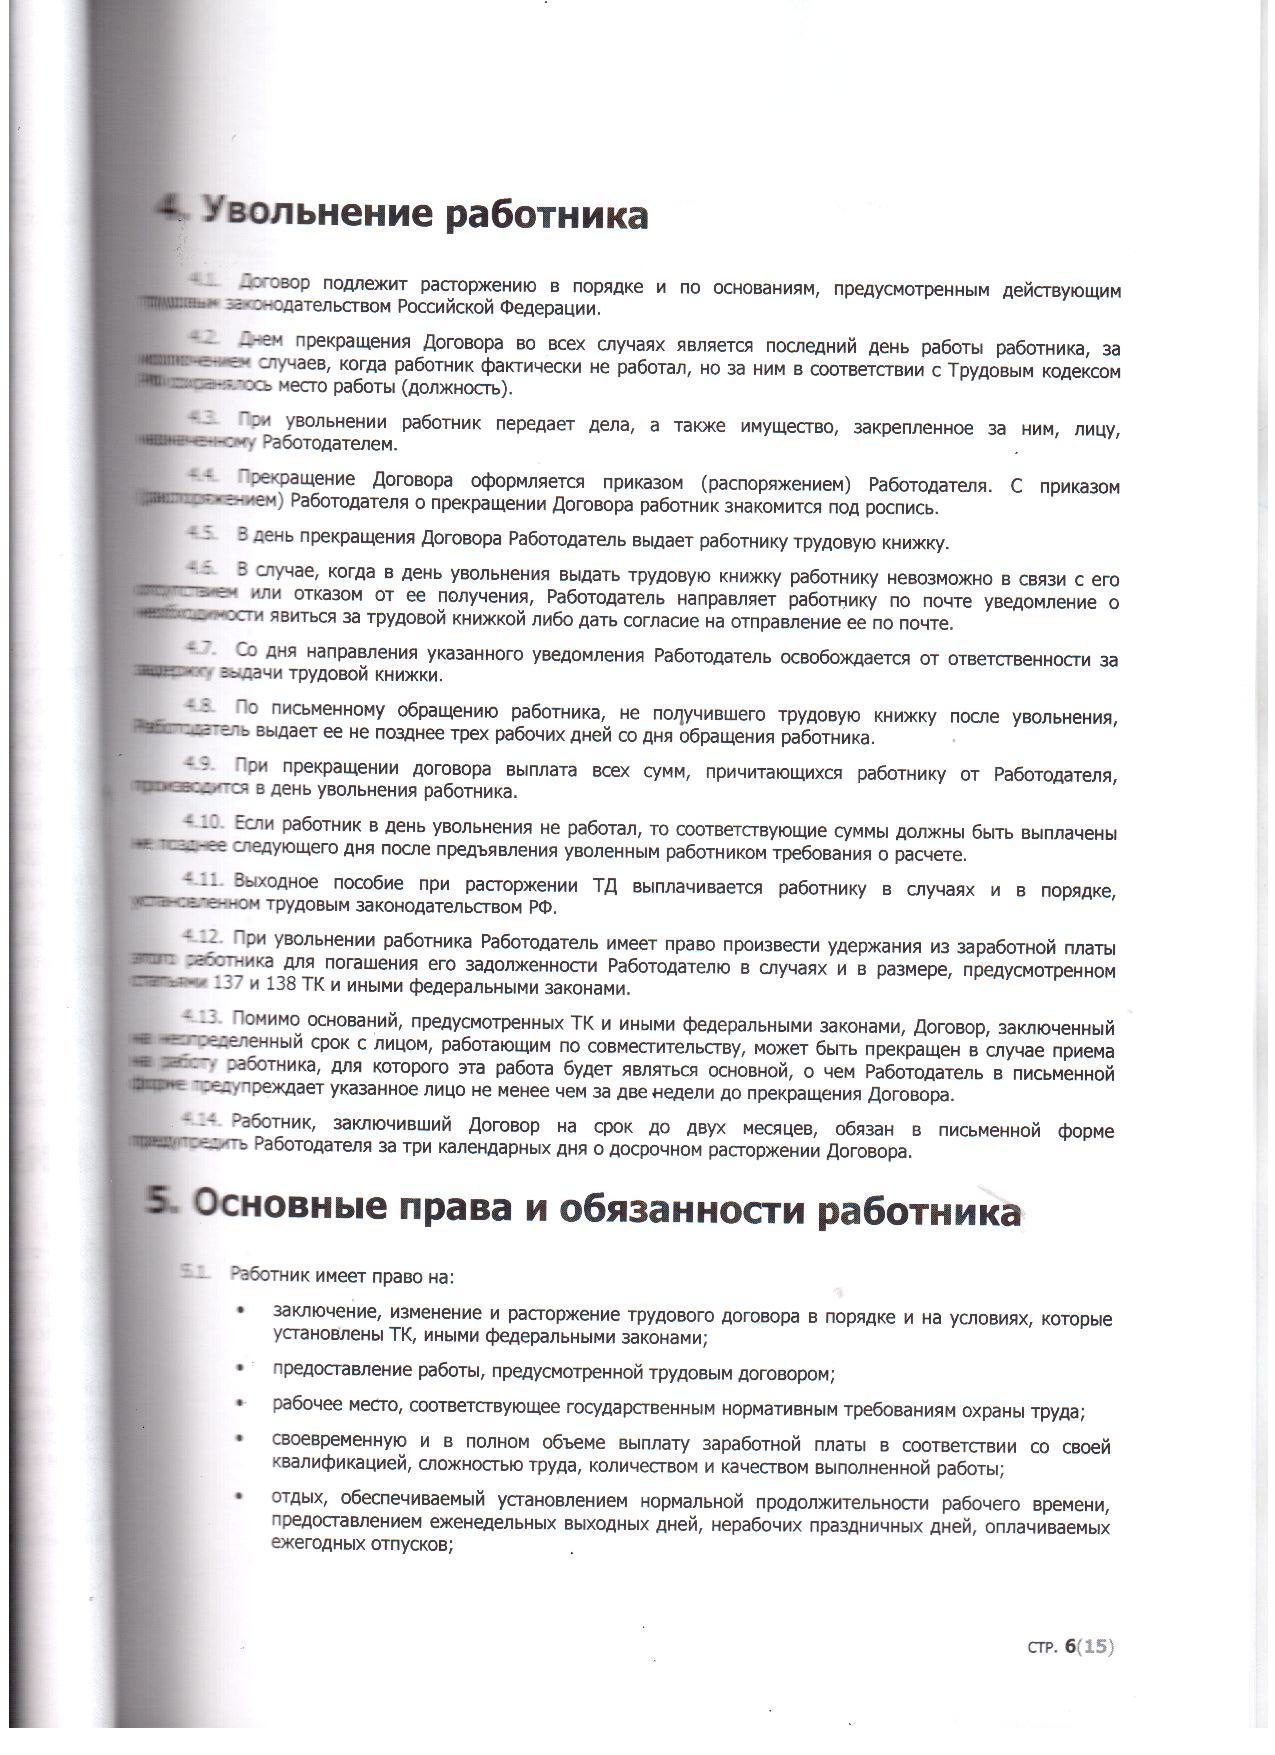 Правила внутреннего трудоговоро распорядка 6